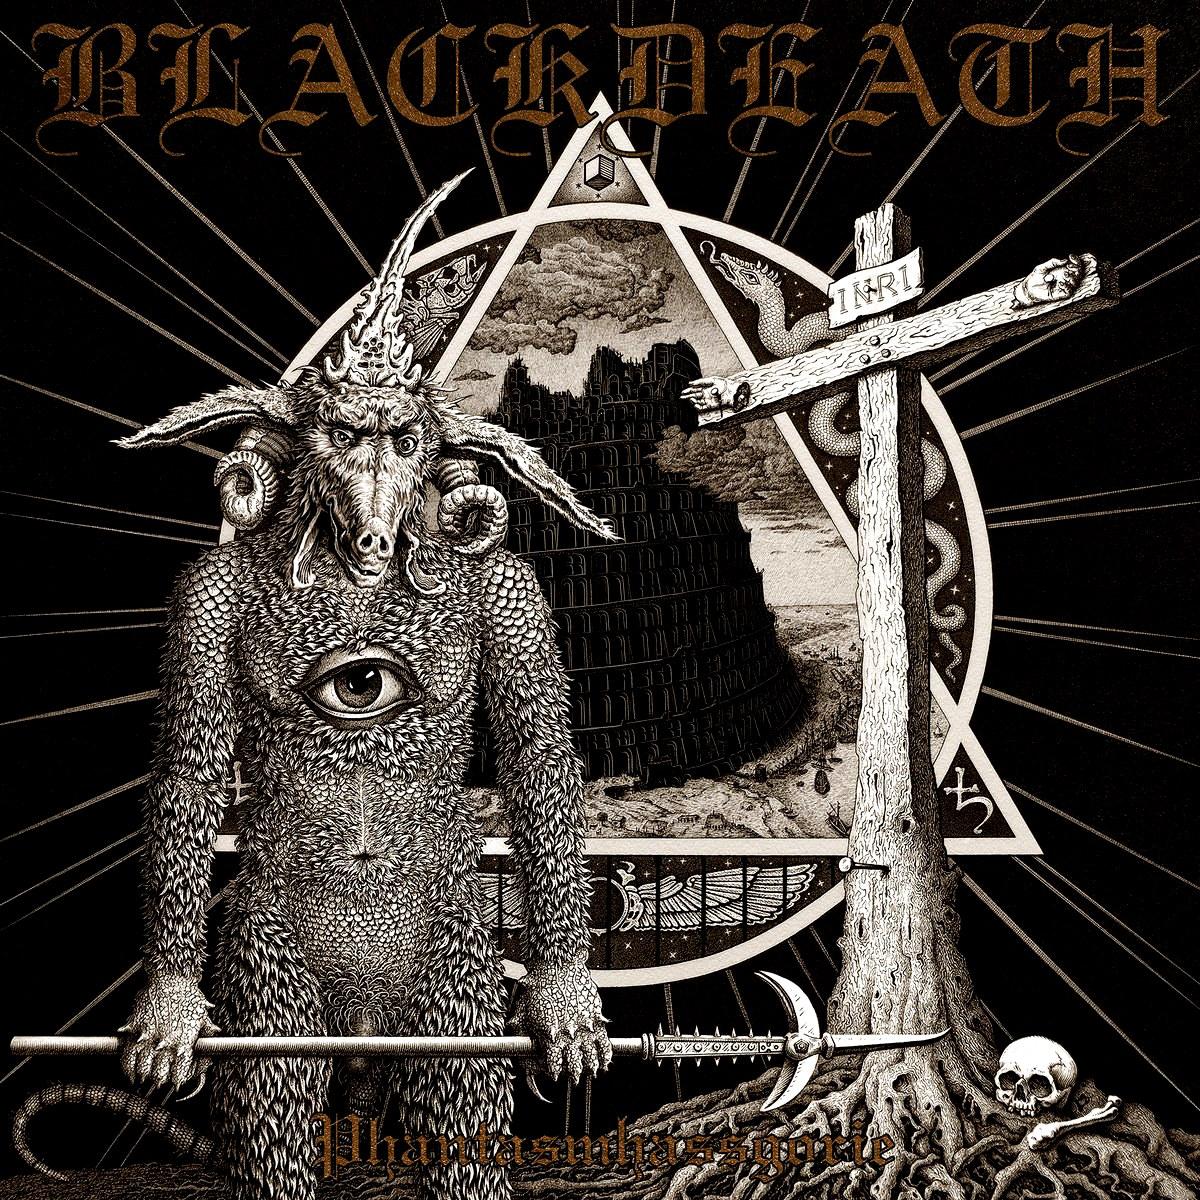 Review for Blackdeath - Phantasmhassgorie